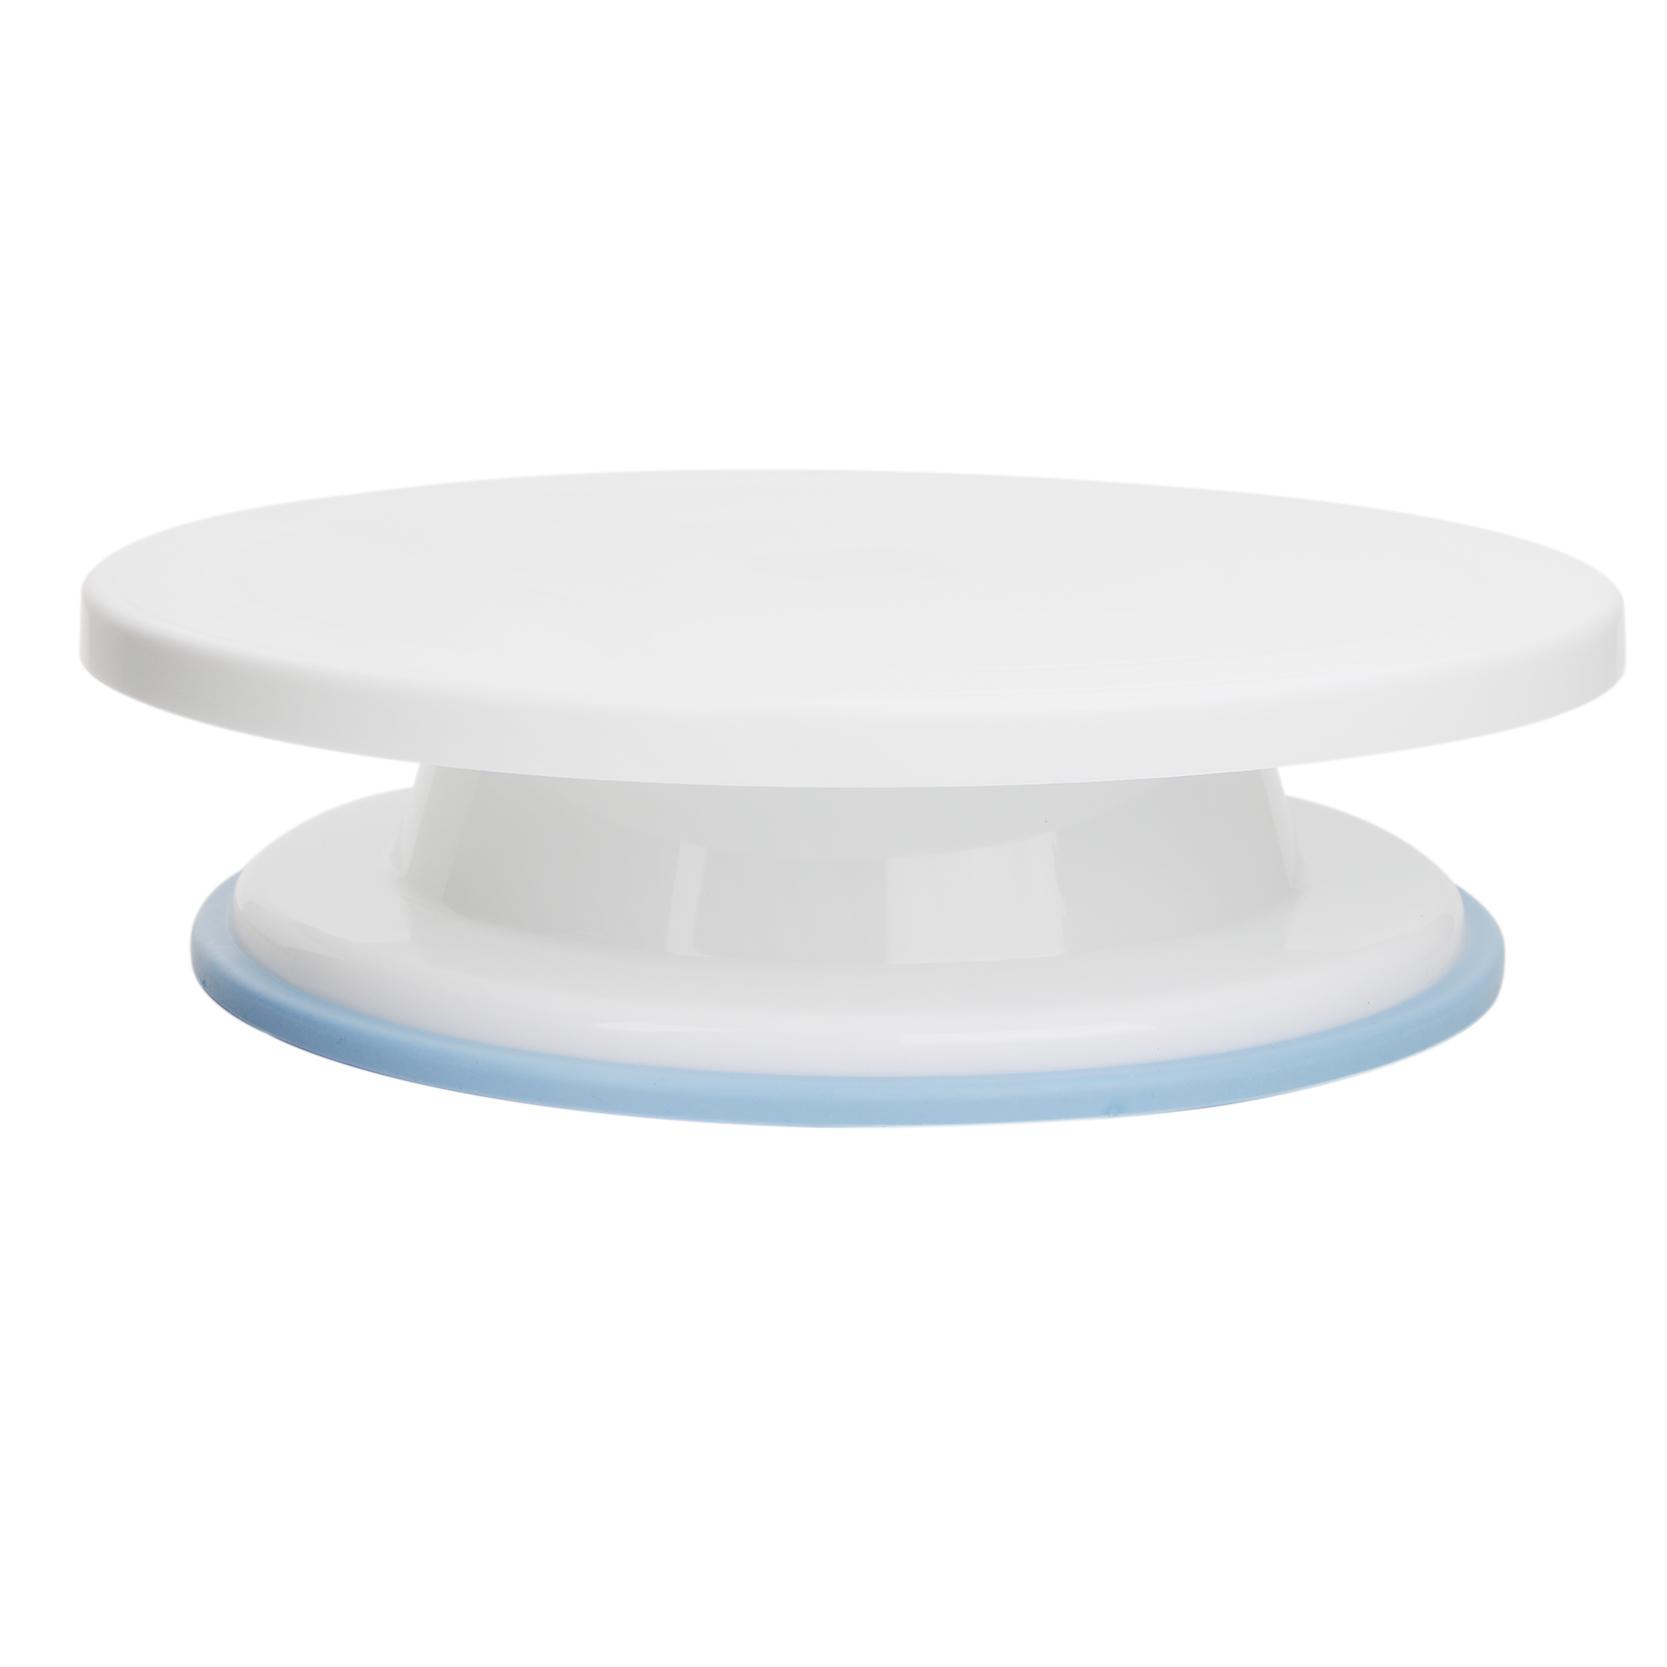 New Plastic Cake Turntable Rotating Cake Decorating Turntable General/Anti-skid Round Cake Stand Cake Rotary Table(China (Mainland))